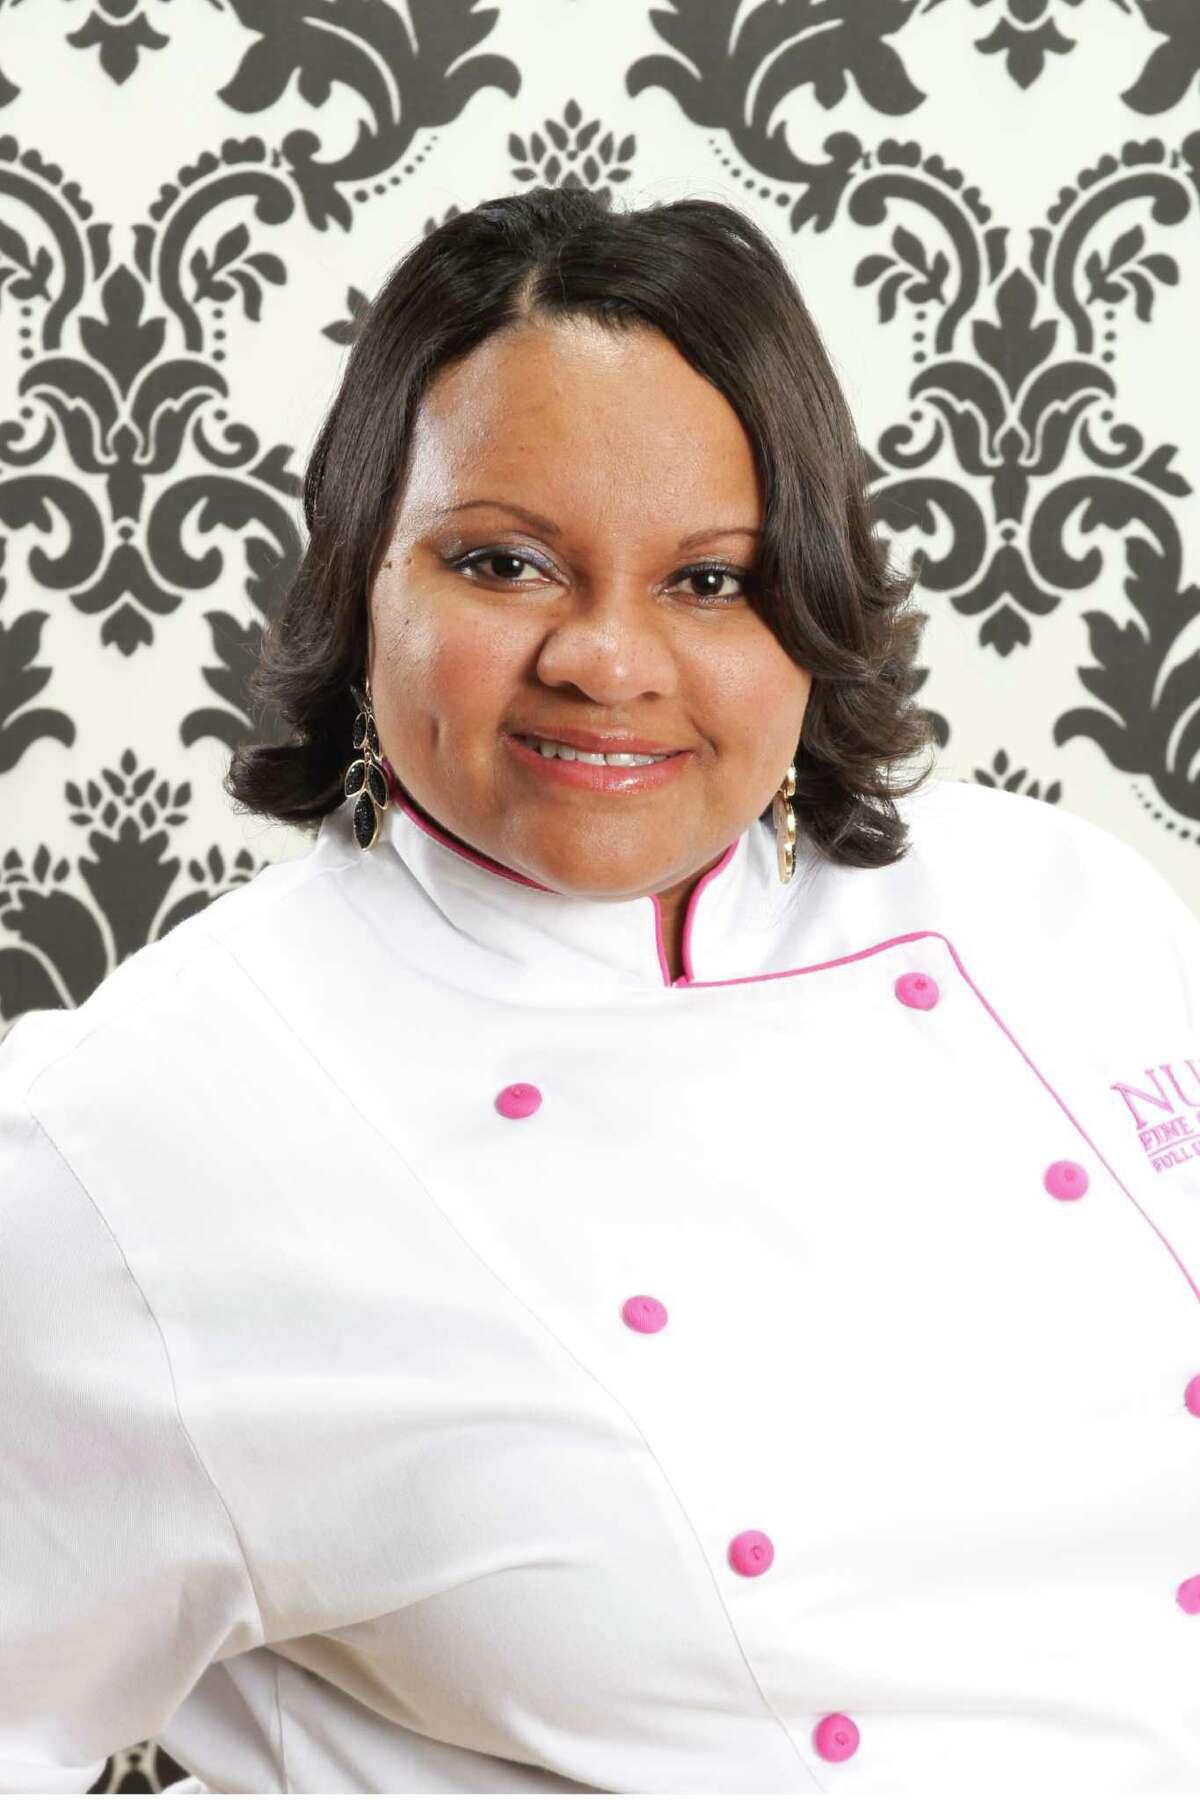 Chef Yolanda Henry will participate in Houston Black Restaurant Week's Harvest the Block, Nov. 4-6, a fall culinary series highlighting Texas' black farmers.